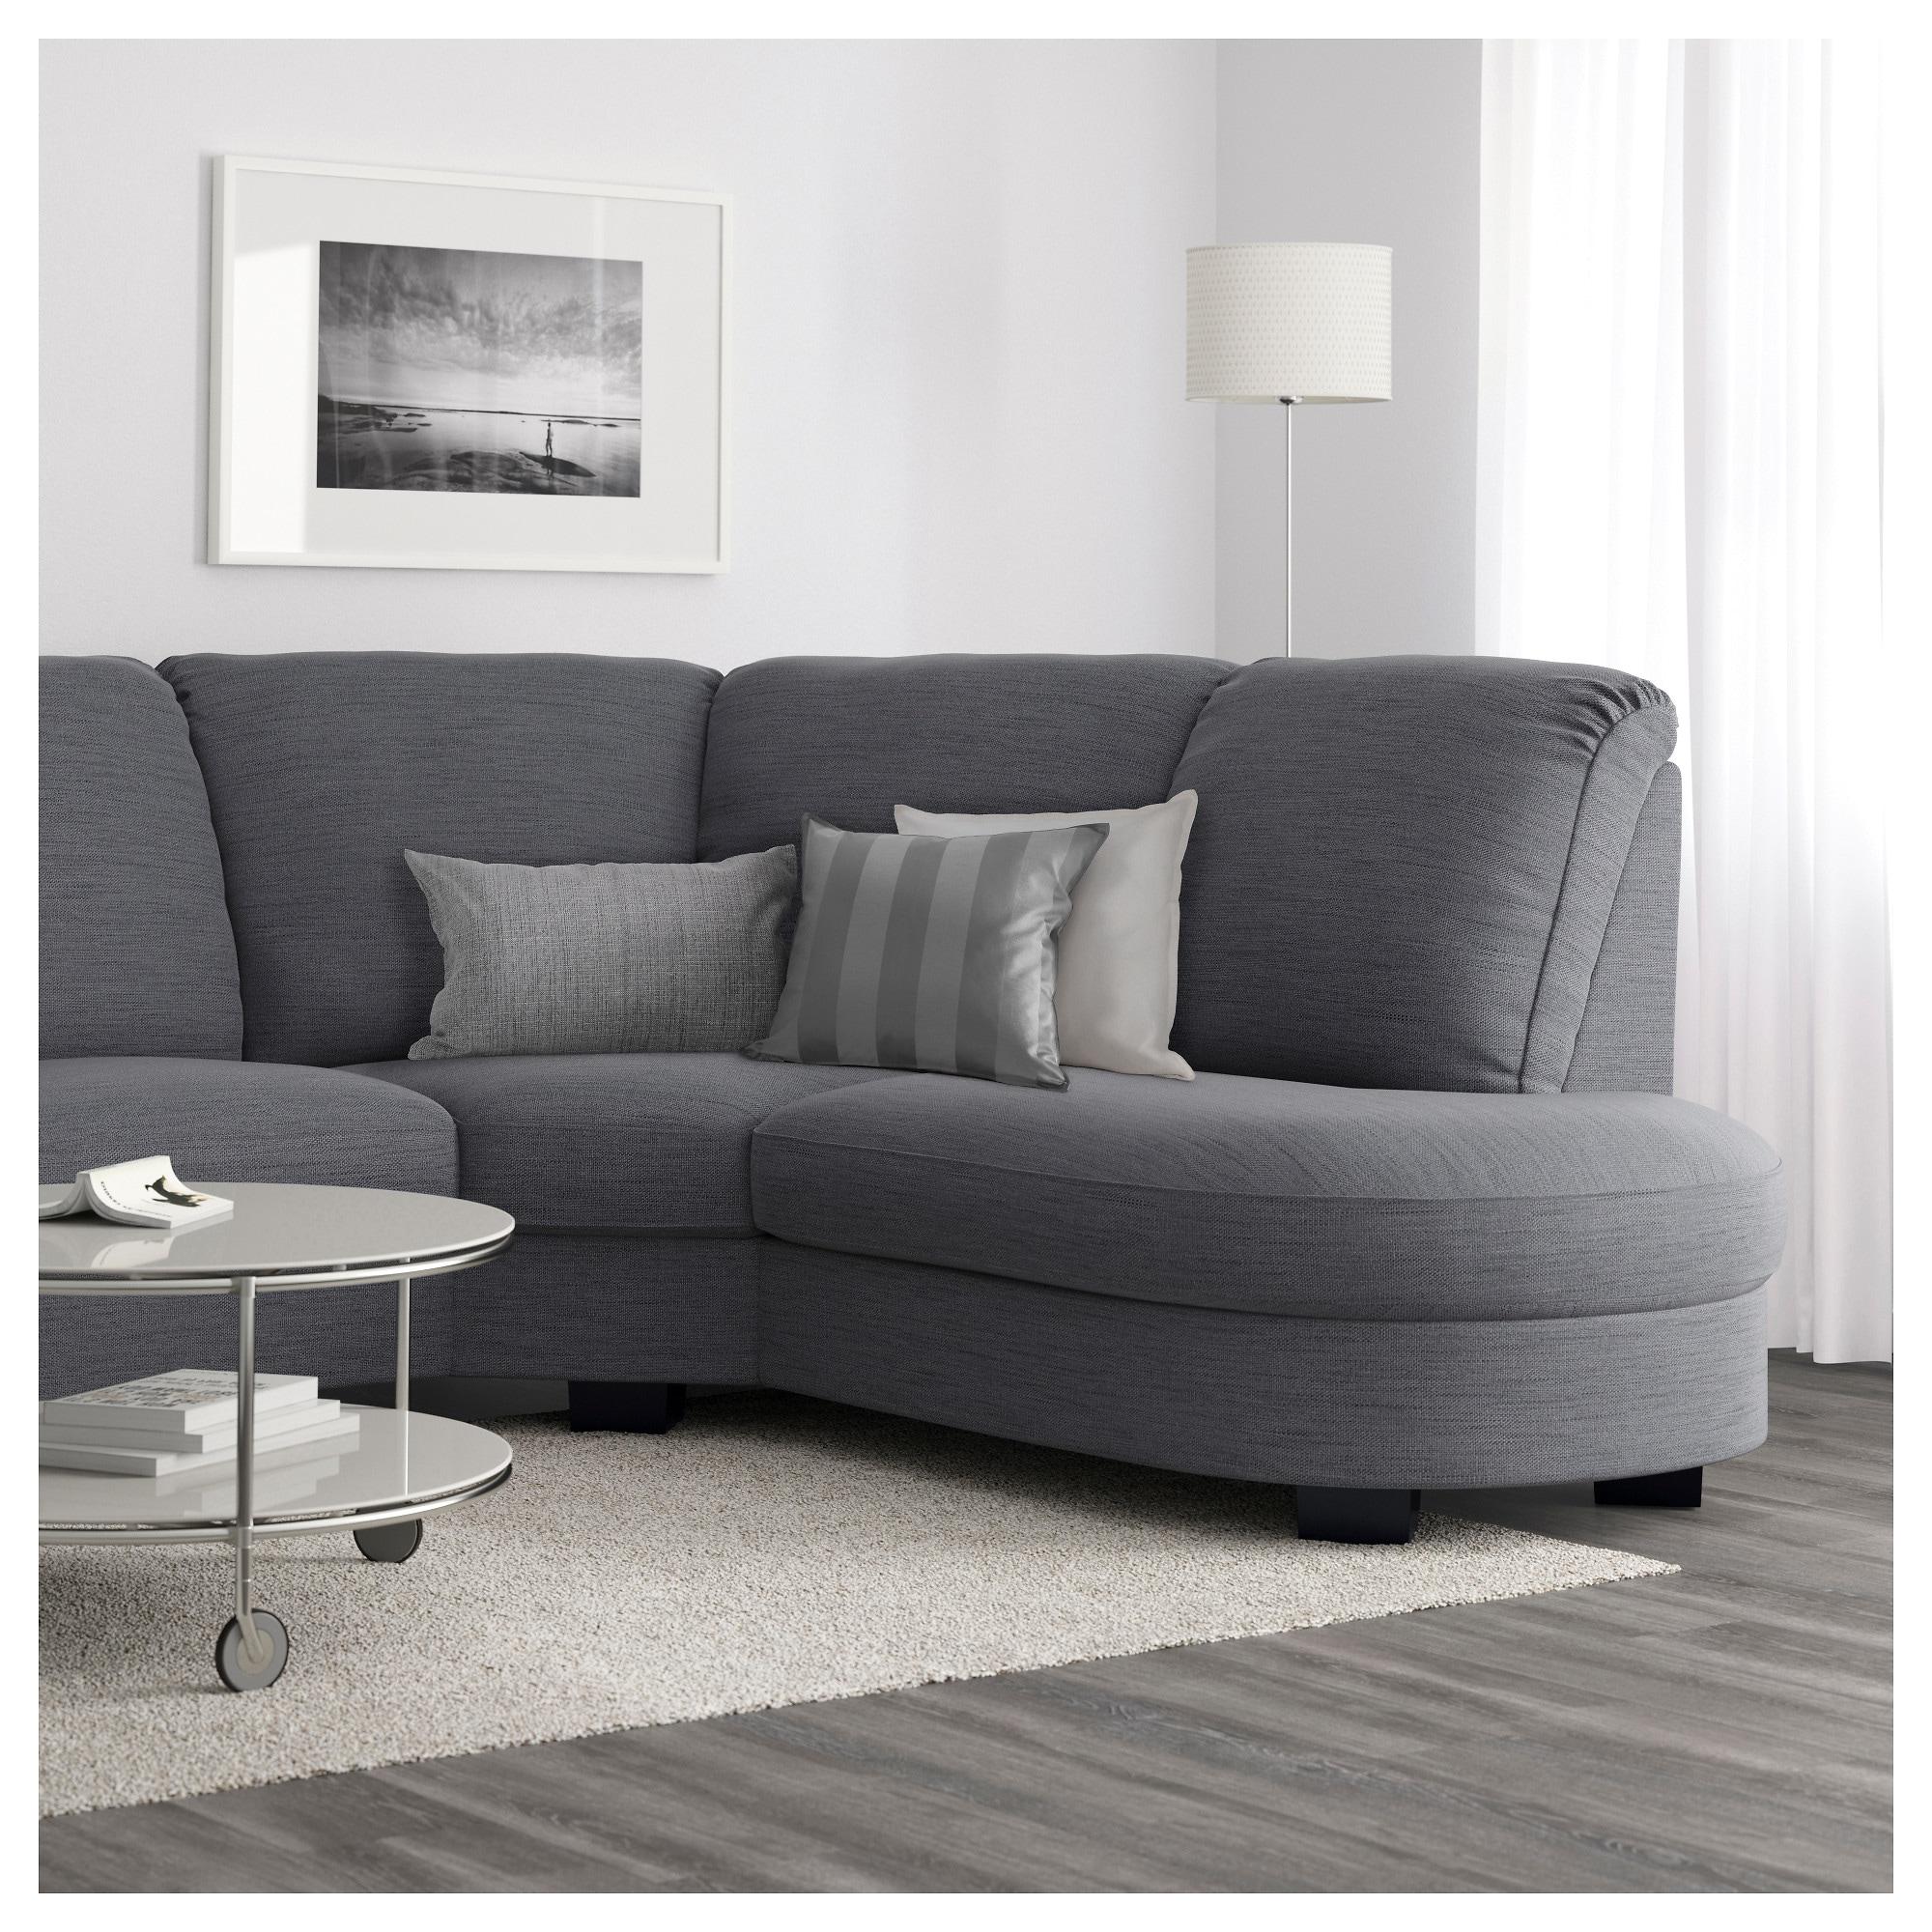 Sofa Tidafors Rldj Tidafors Corner sofa with Arm Right Hensta Grey Ikea